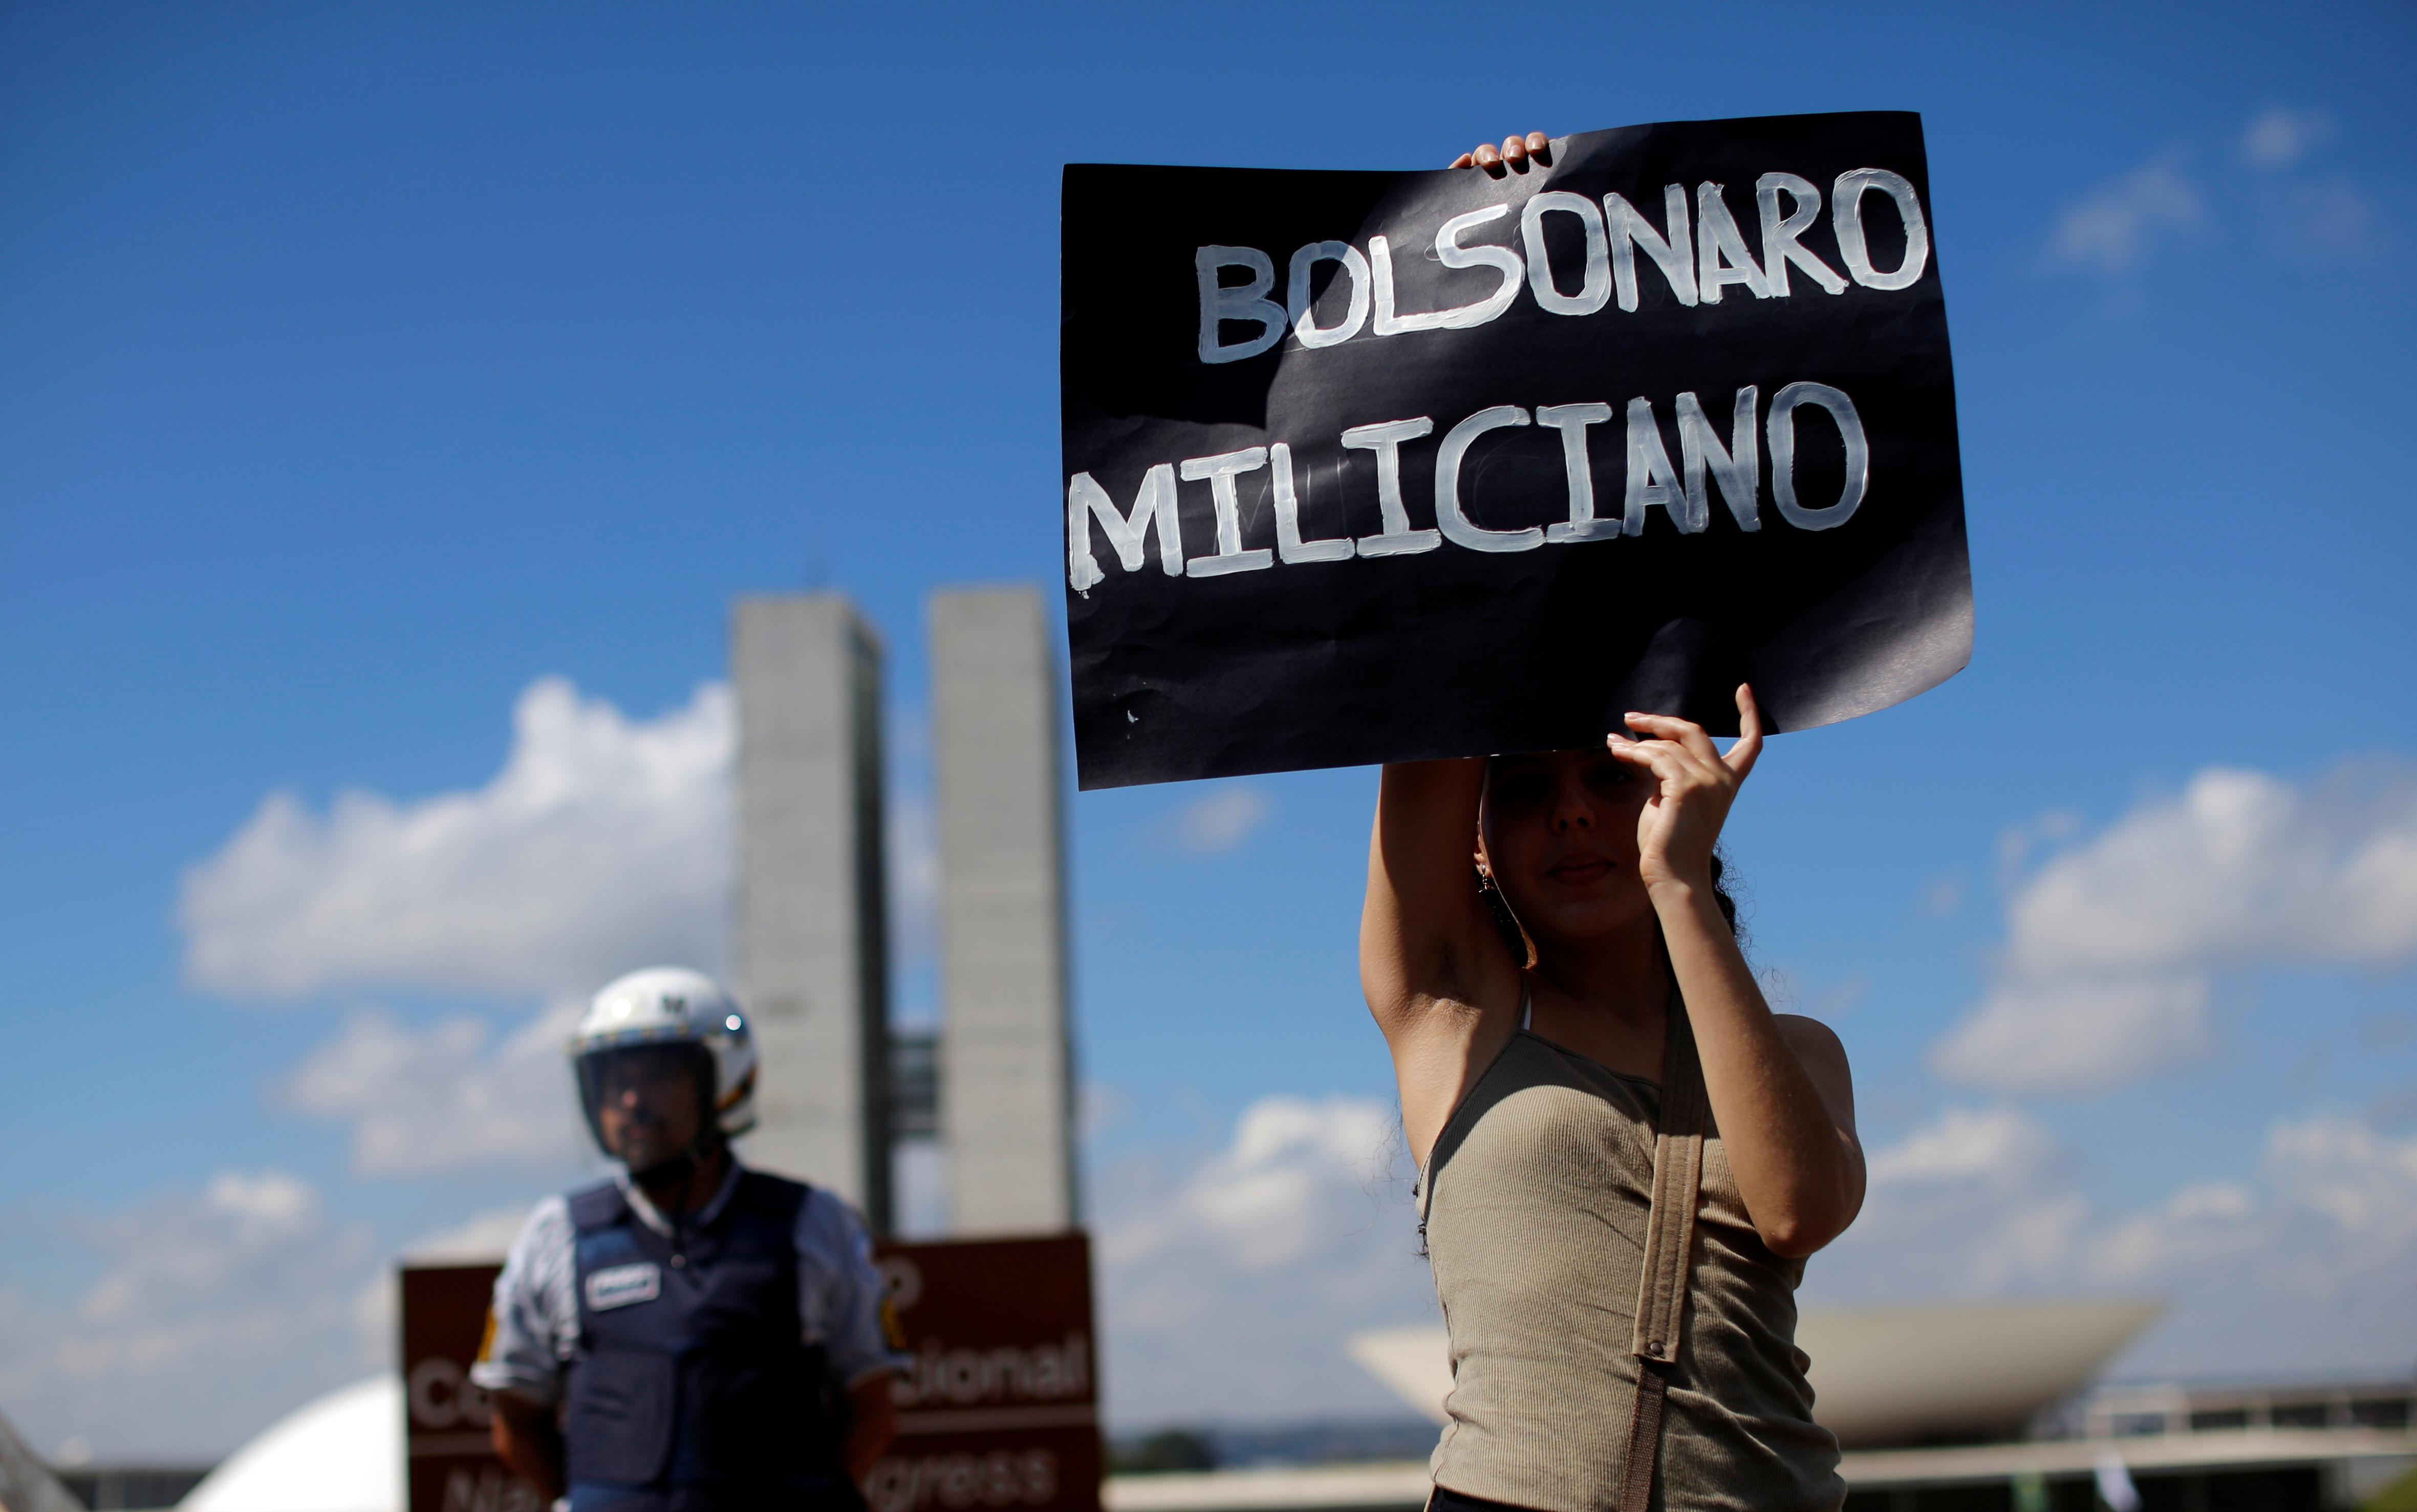 2019-05-15T170728Z_703490536_RC1643F7BE20_RTRMADP_3_BRAZIL-POLITICS-EDUCATION